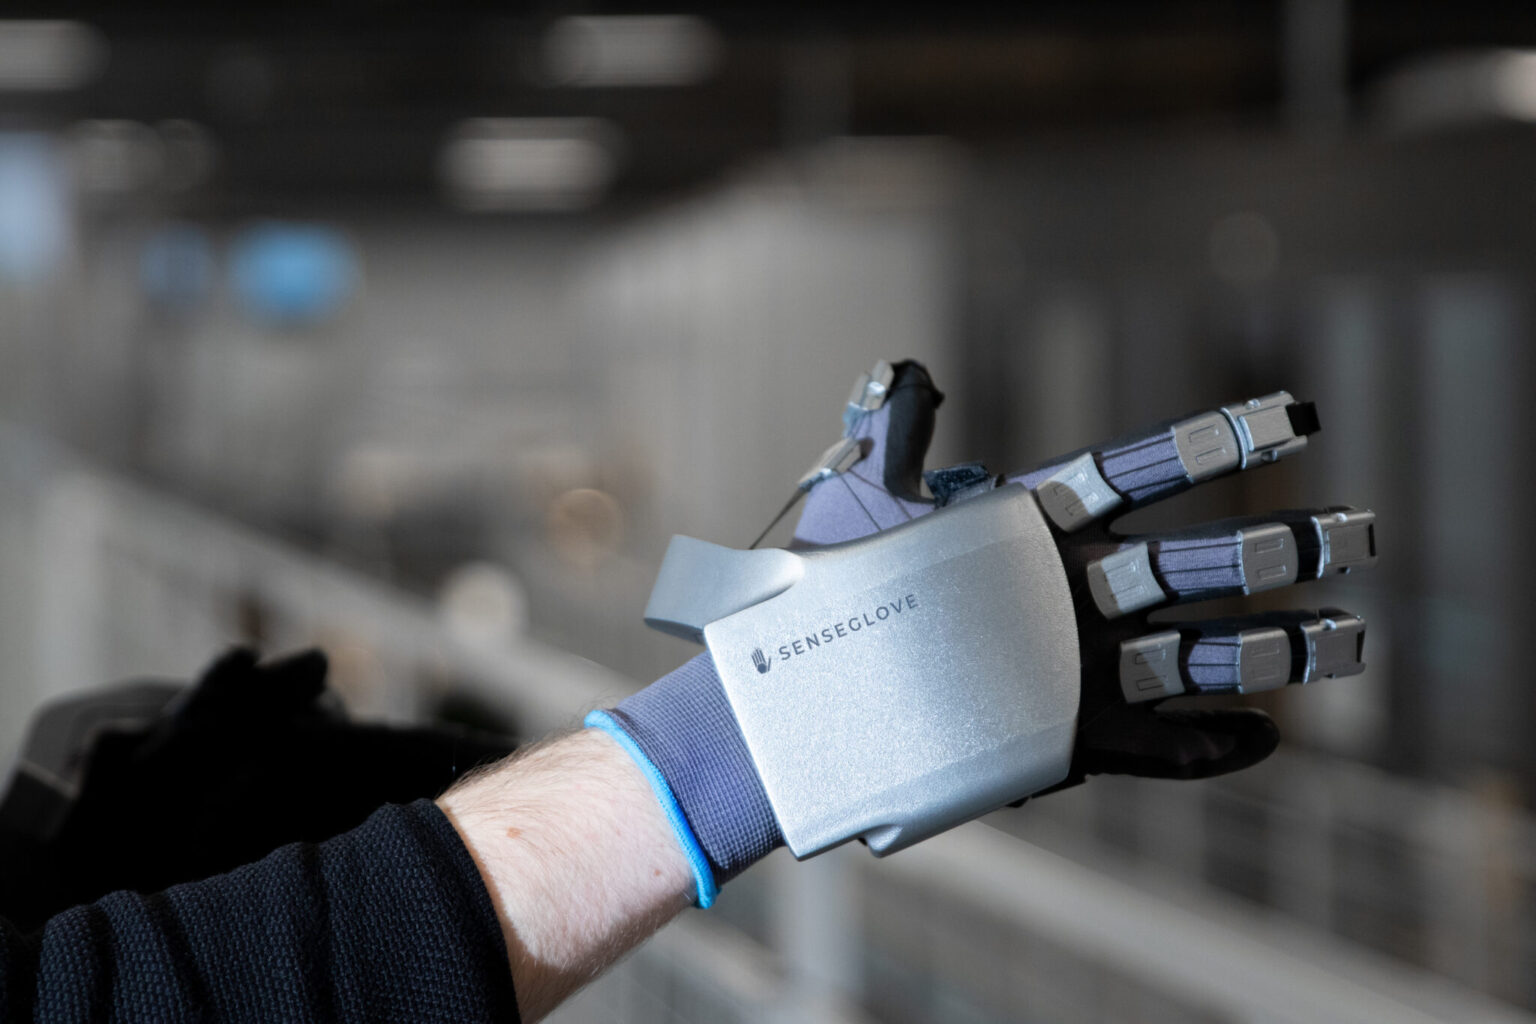 【CES 2021】SenseGlove Nova :专门用于VR培训的新型触觉手套